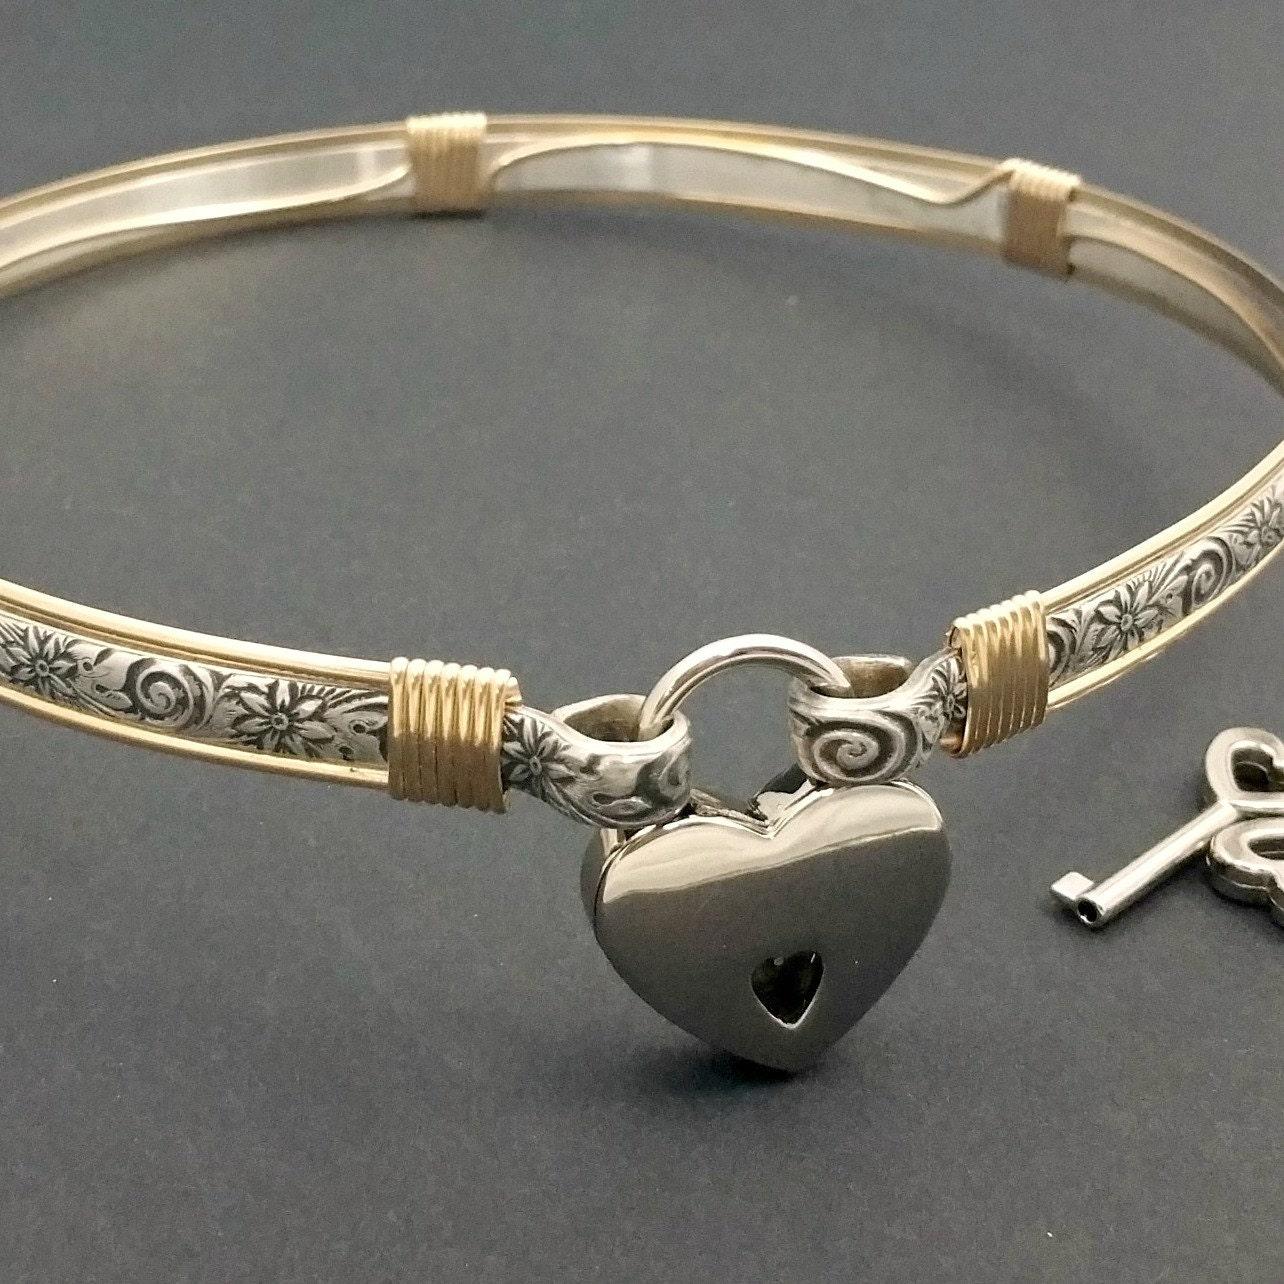 Lockable bdsm collar